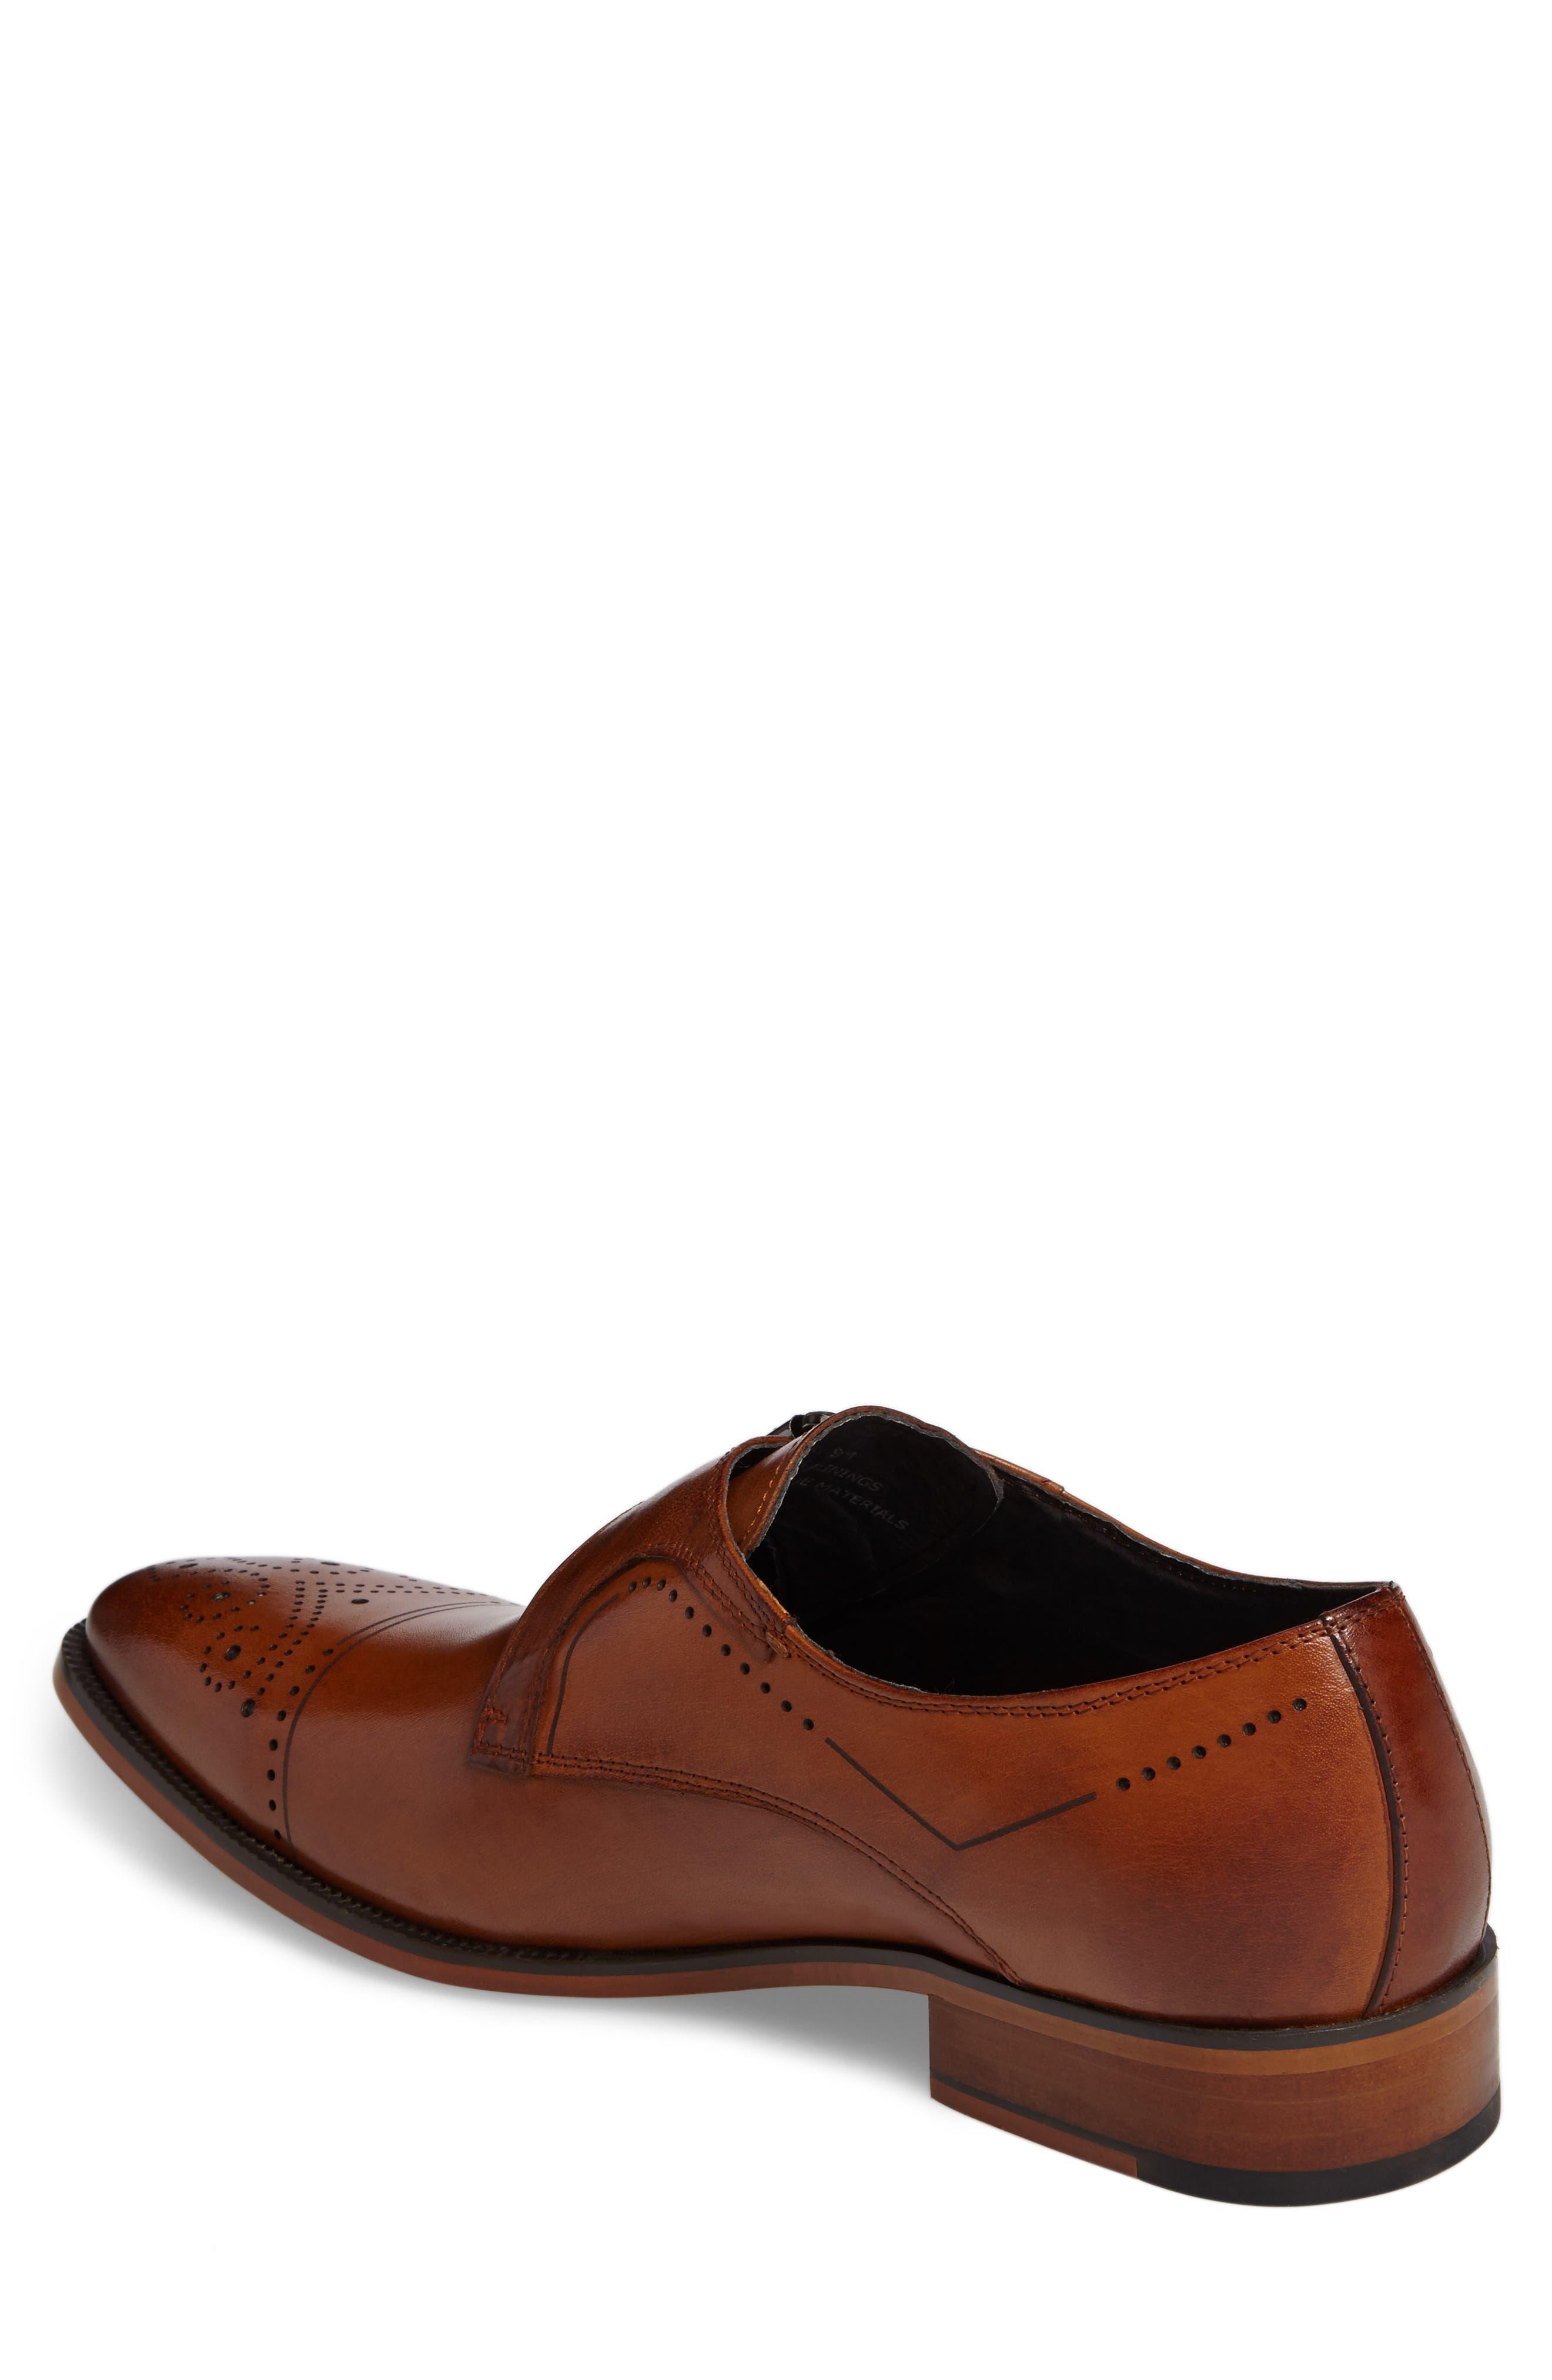 Alternate Image 2  - Stacy Adams Kimball Monk Strap Shoe (Men)